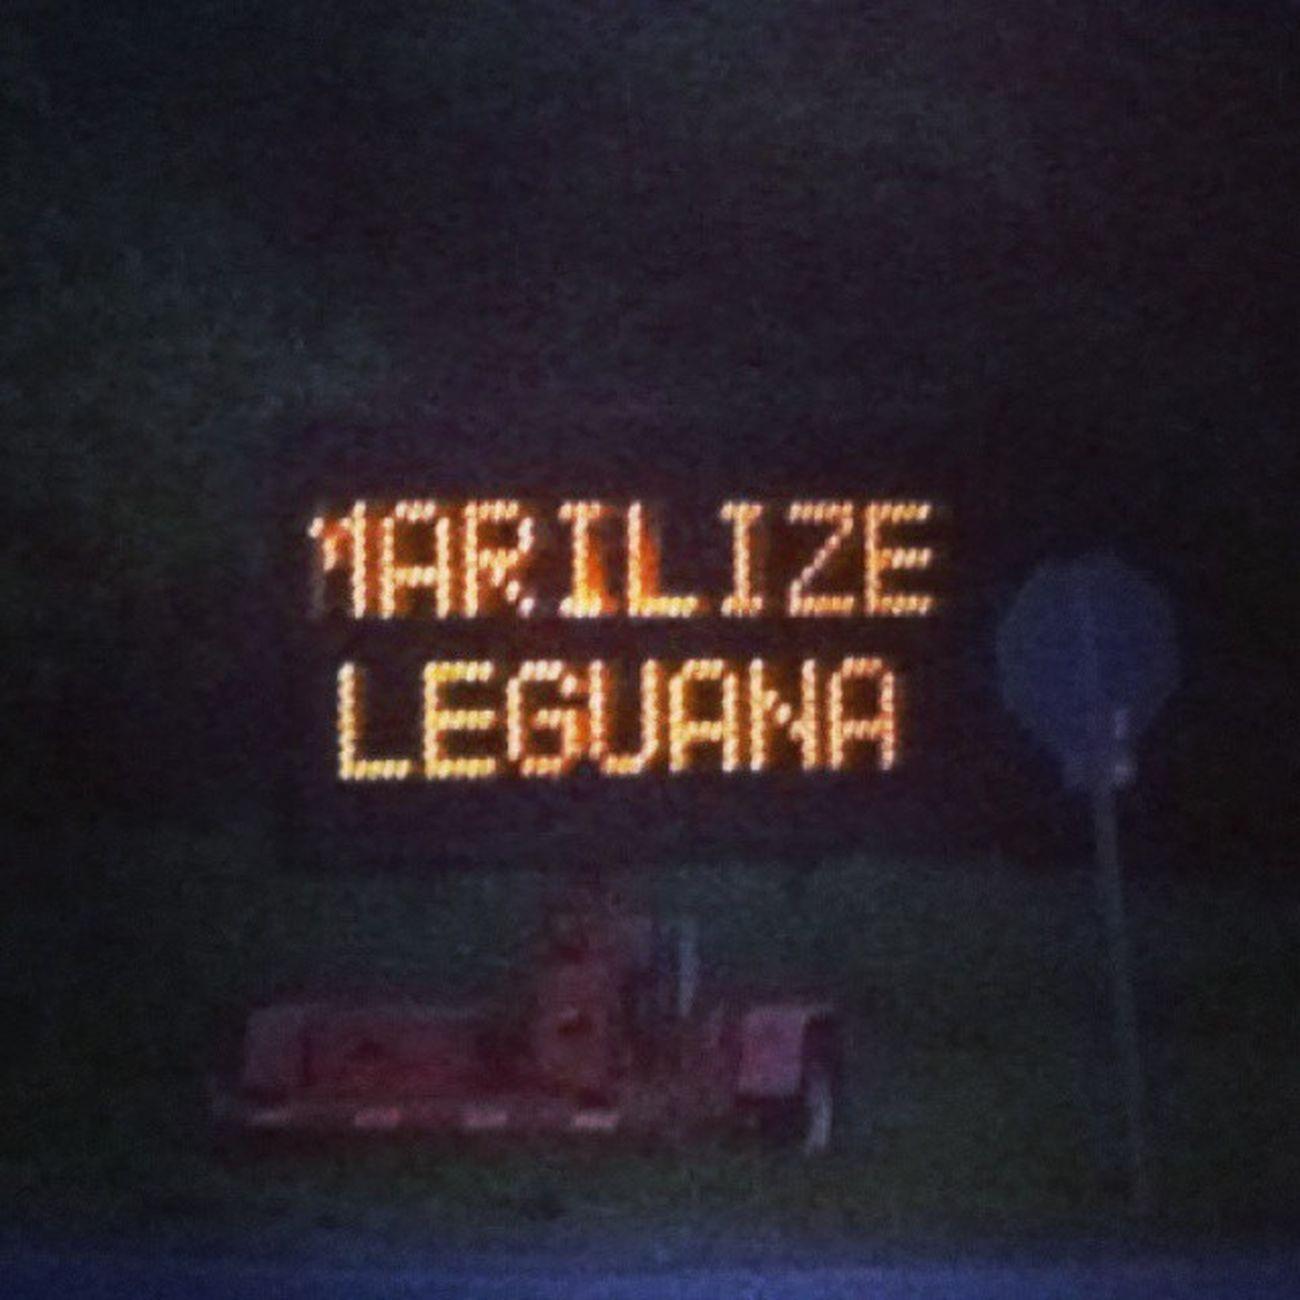 Marijuana Theywantme Marilizeleguana ☀ Afriendwithweedisafriendindeed Tumblr